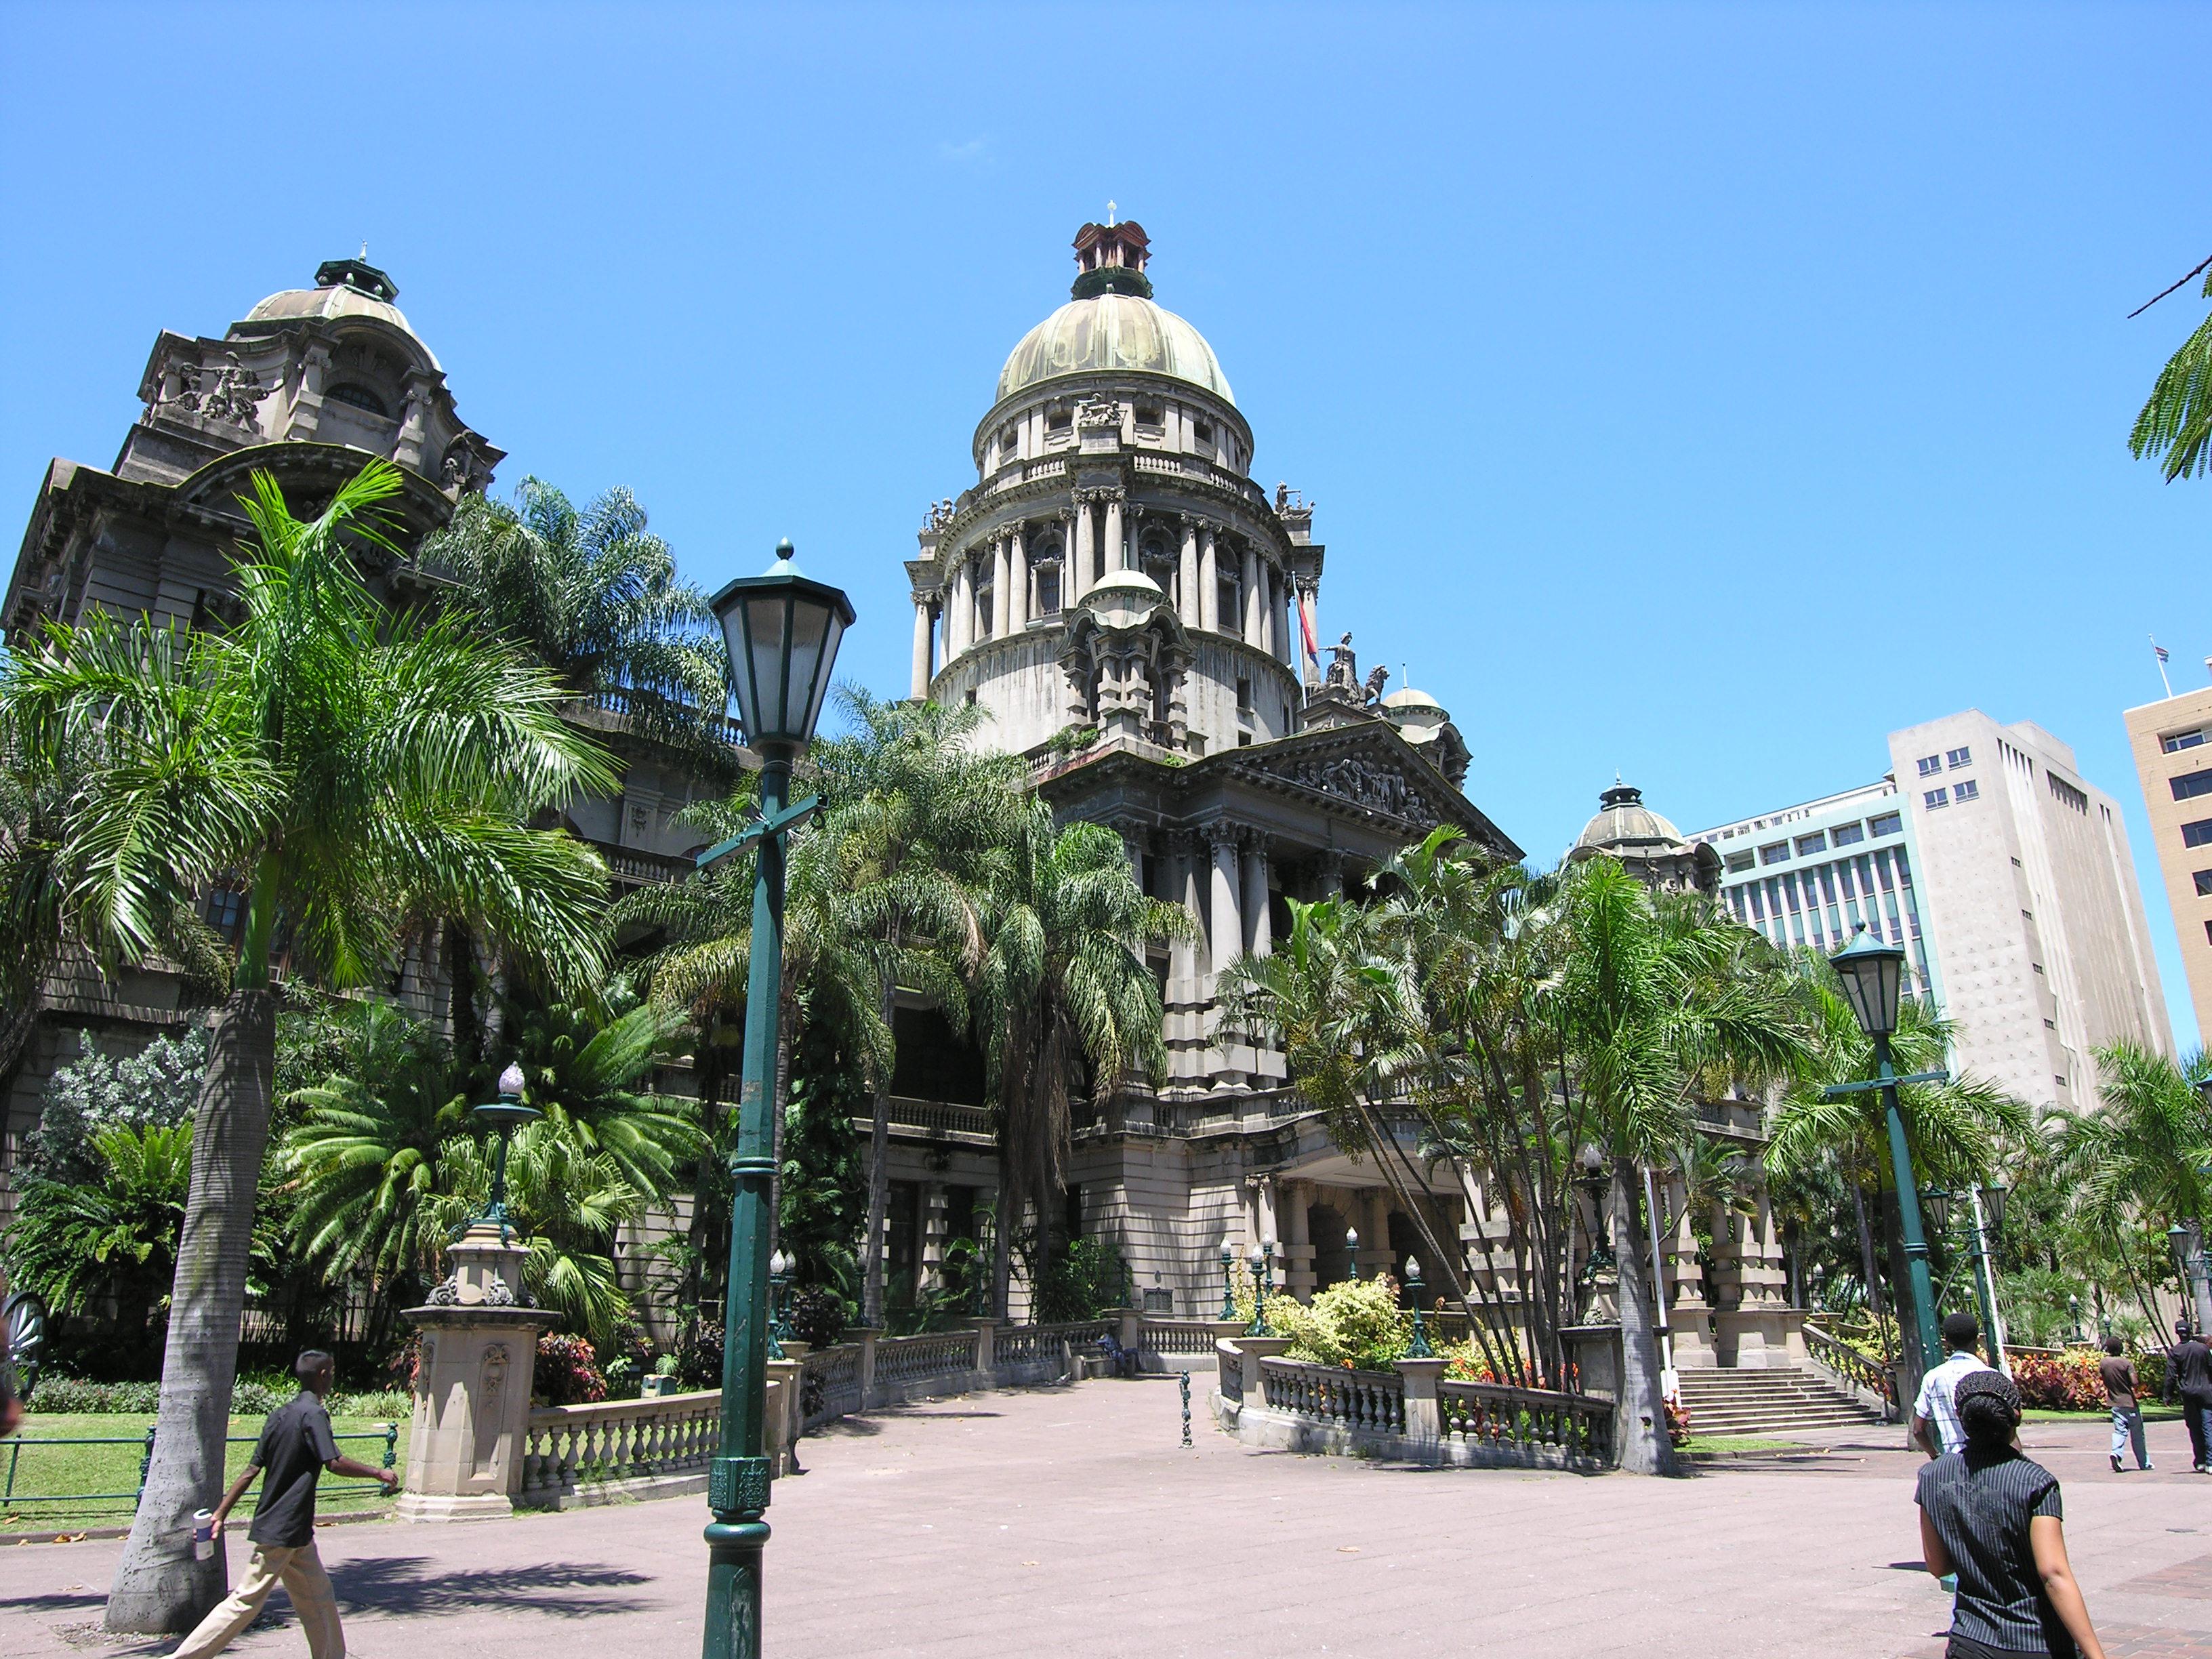 Durban Town Hall. Photo: Chris Eason, Flickr